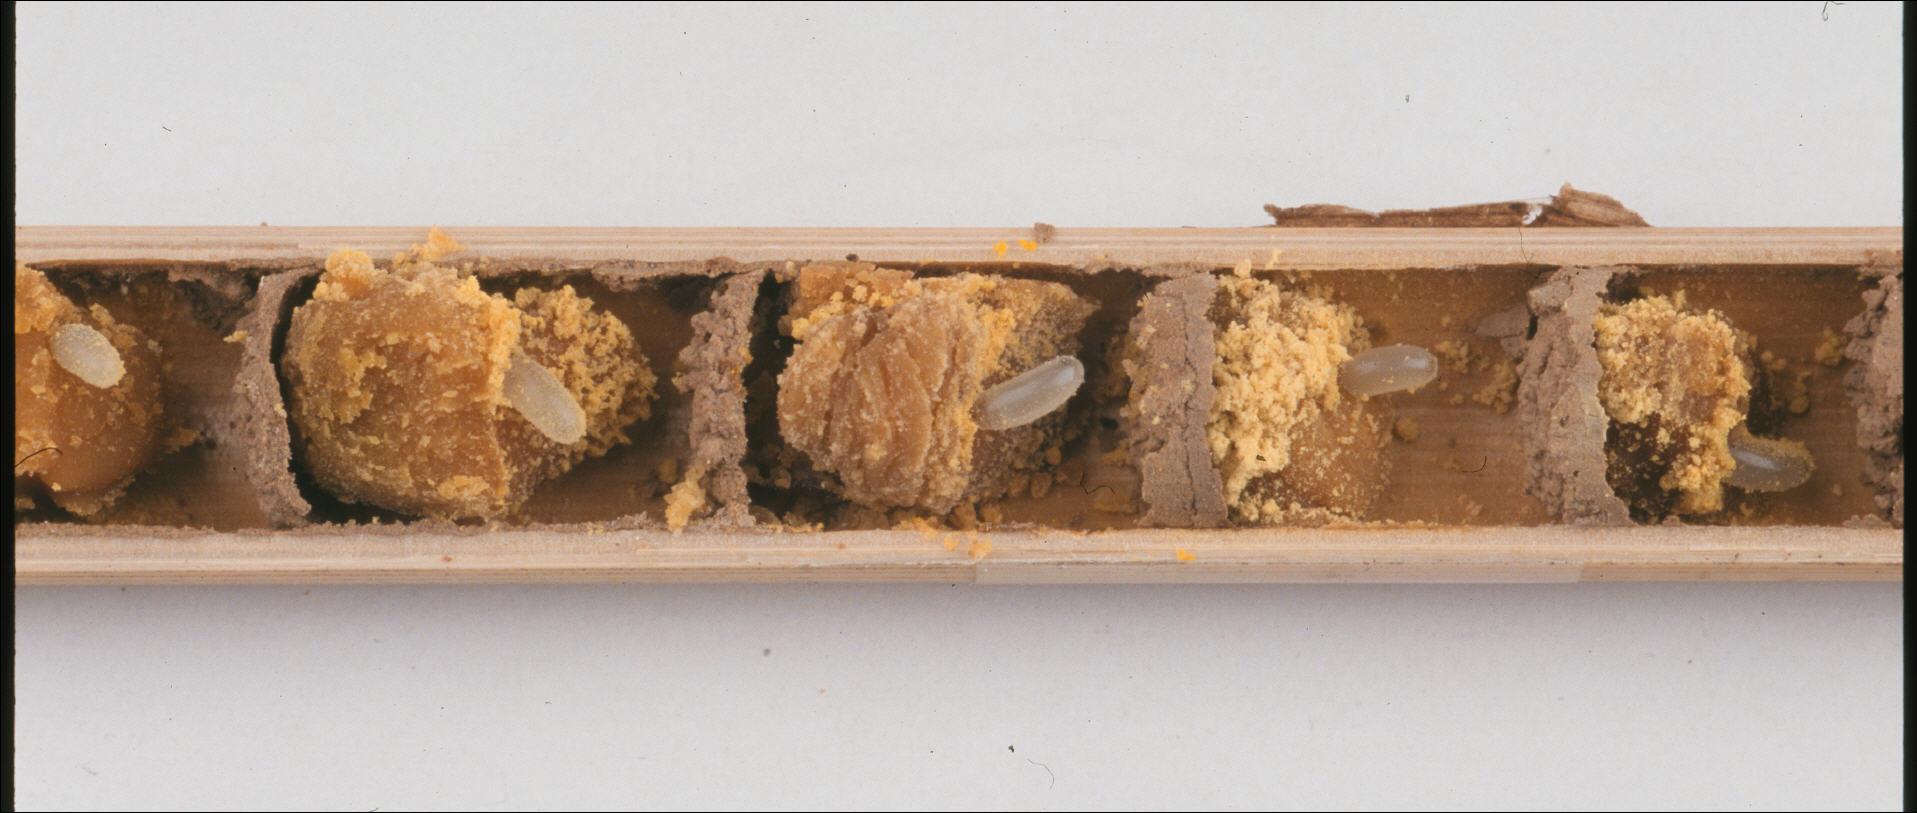 La vida secreta de las abejas | All you need is Biology